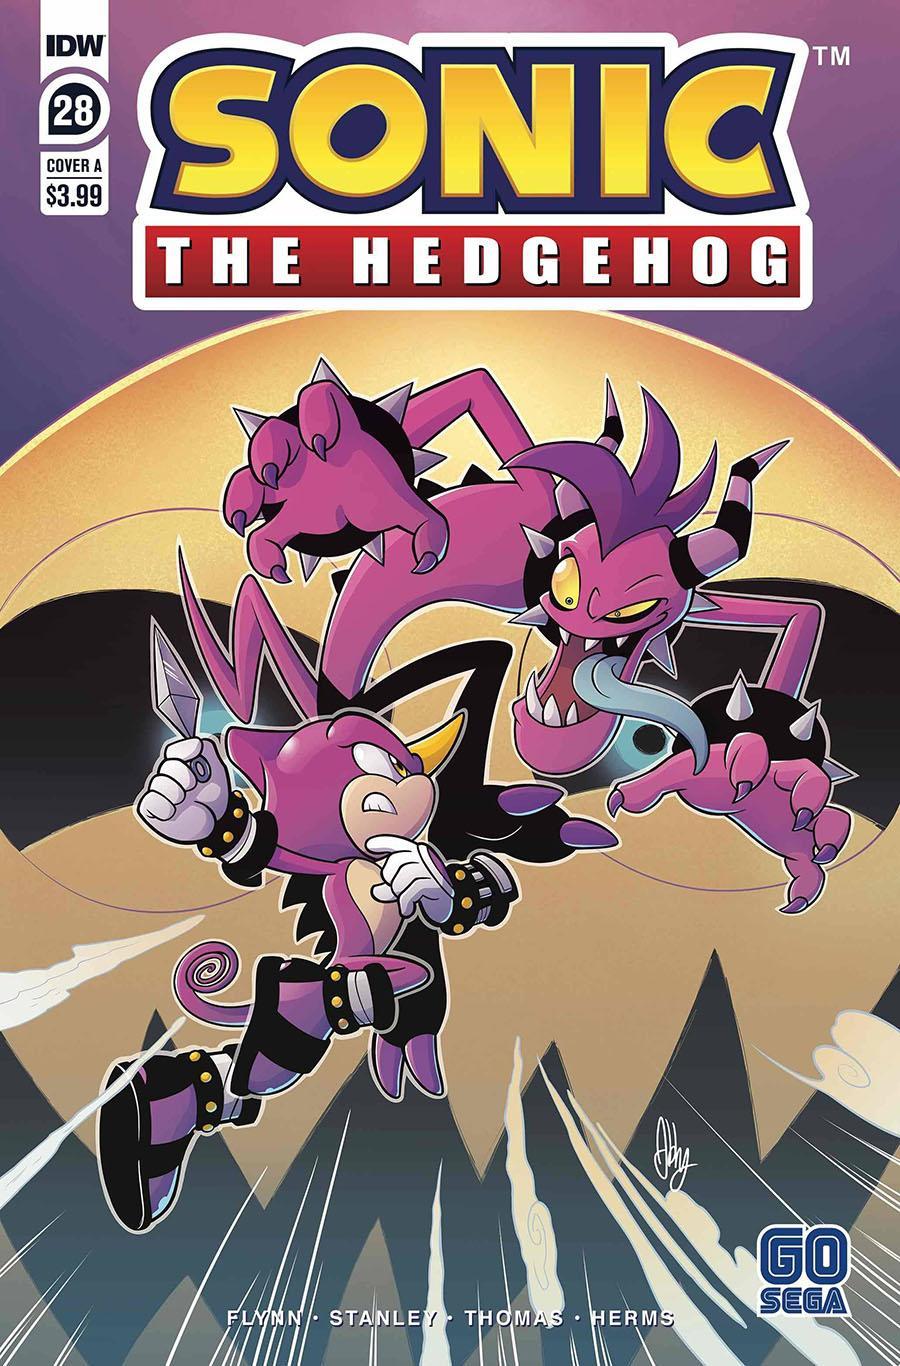 Sonic The Hedgehog Vol 3 #28 Cover A Regular Abby Bulmer Cover